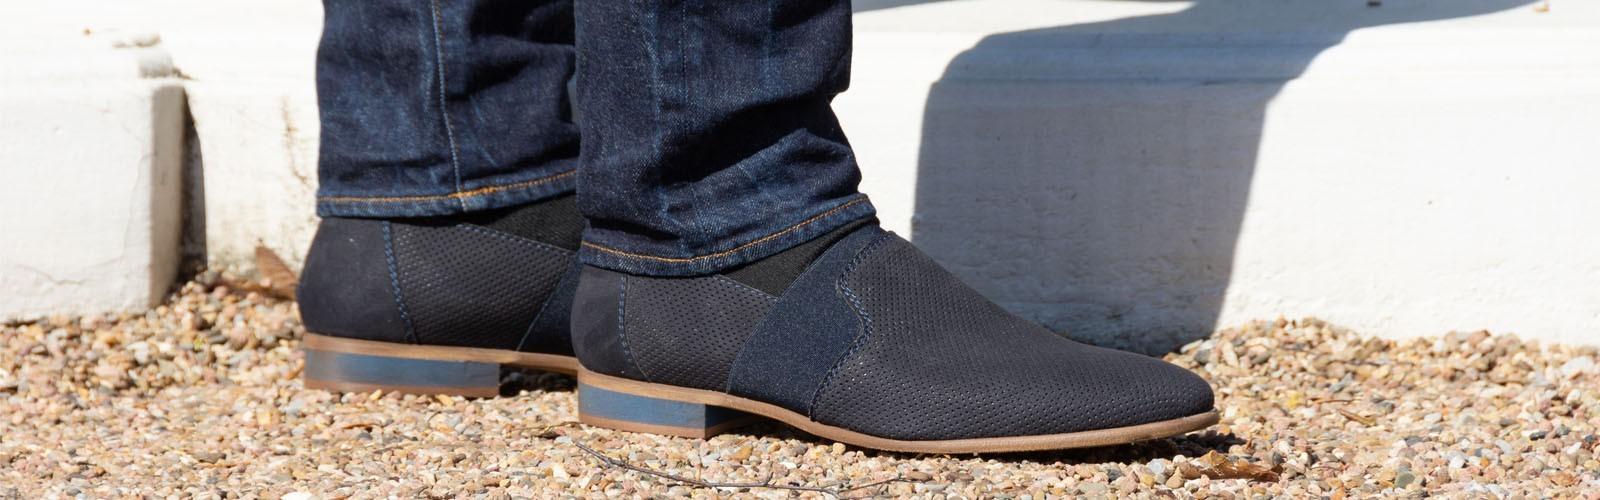 Chaussures  loisir homme vegan